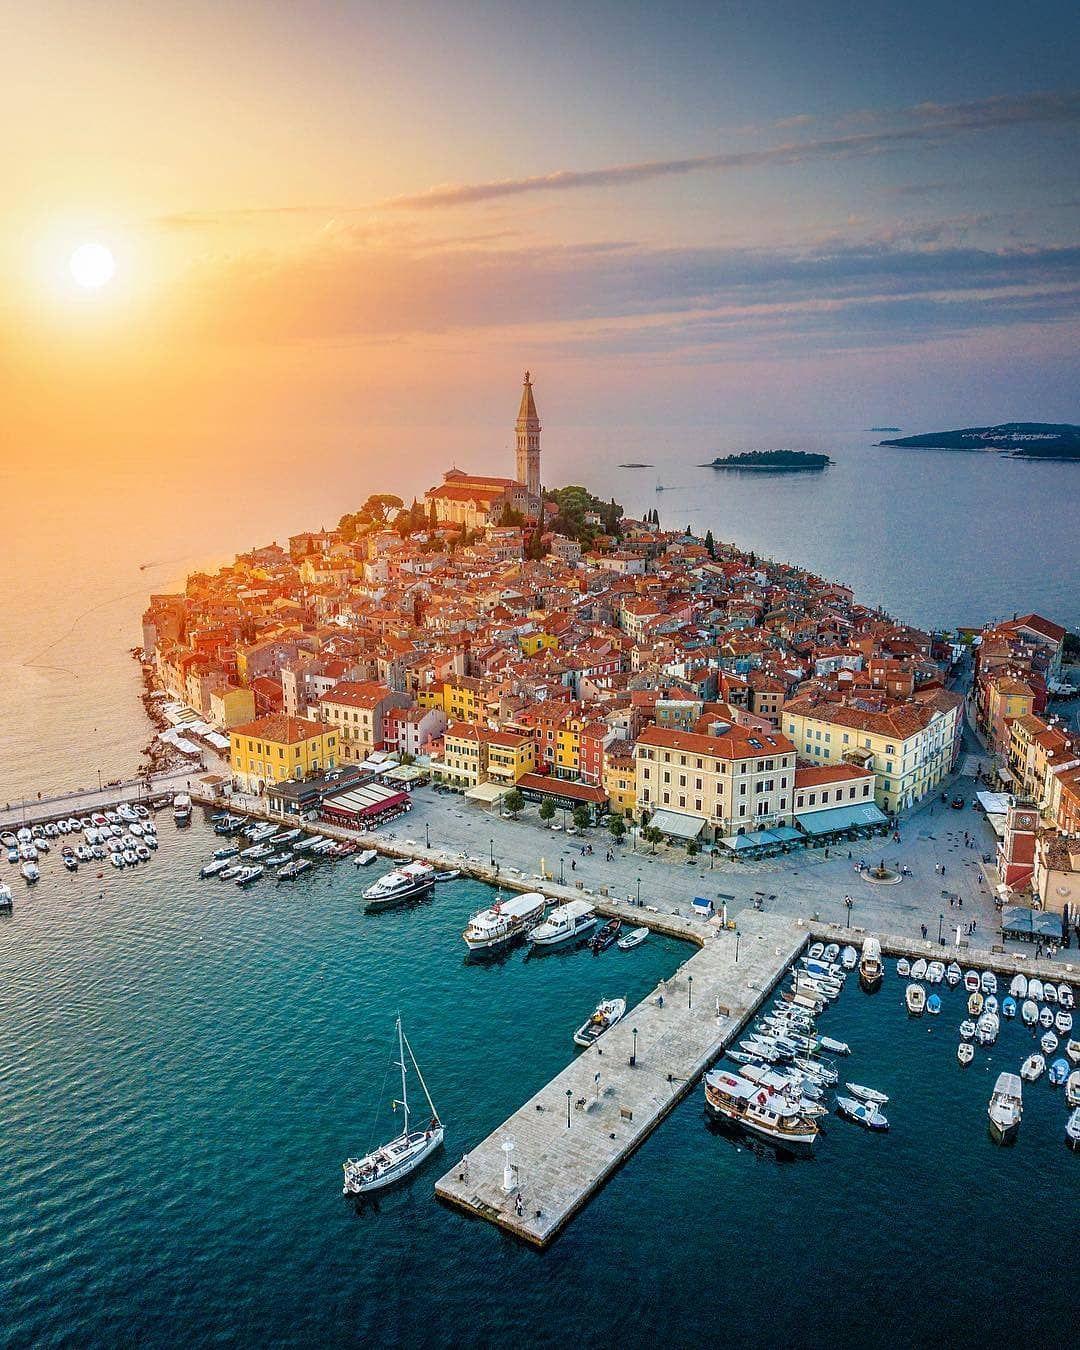 Istra, Croatia - My Travel Guide to a Hidden Gem